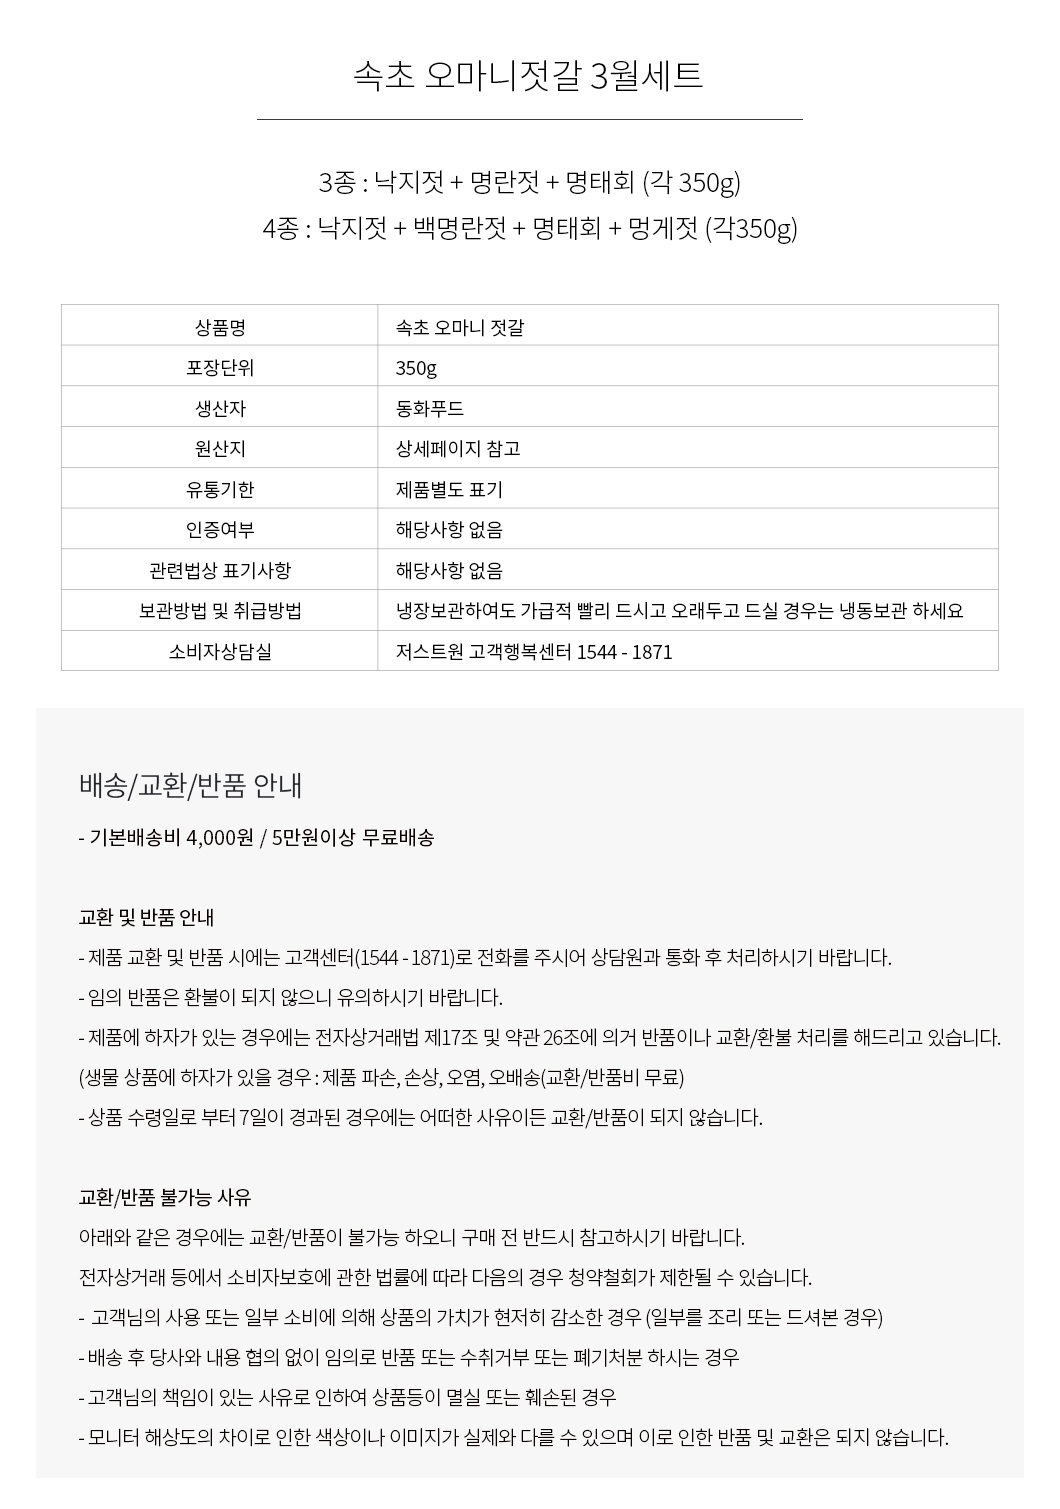 donghwa_set07.jpg